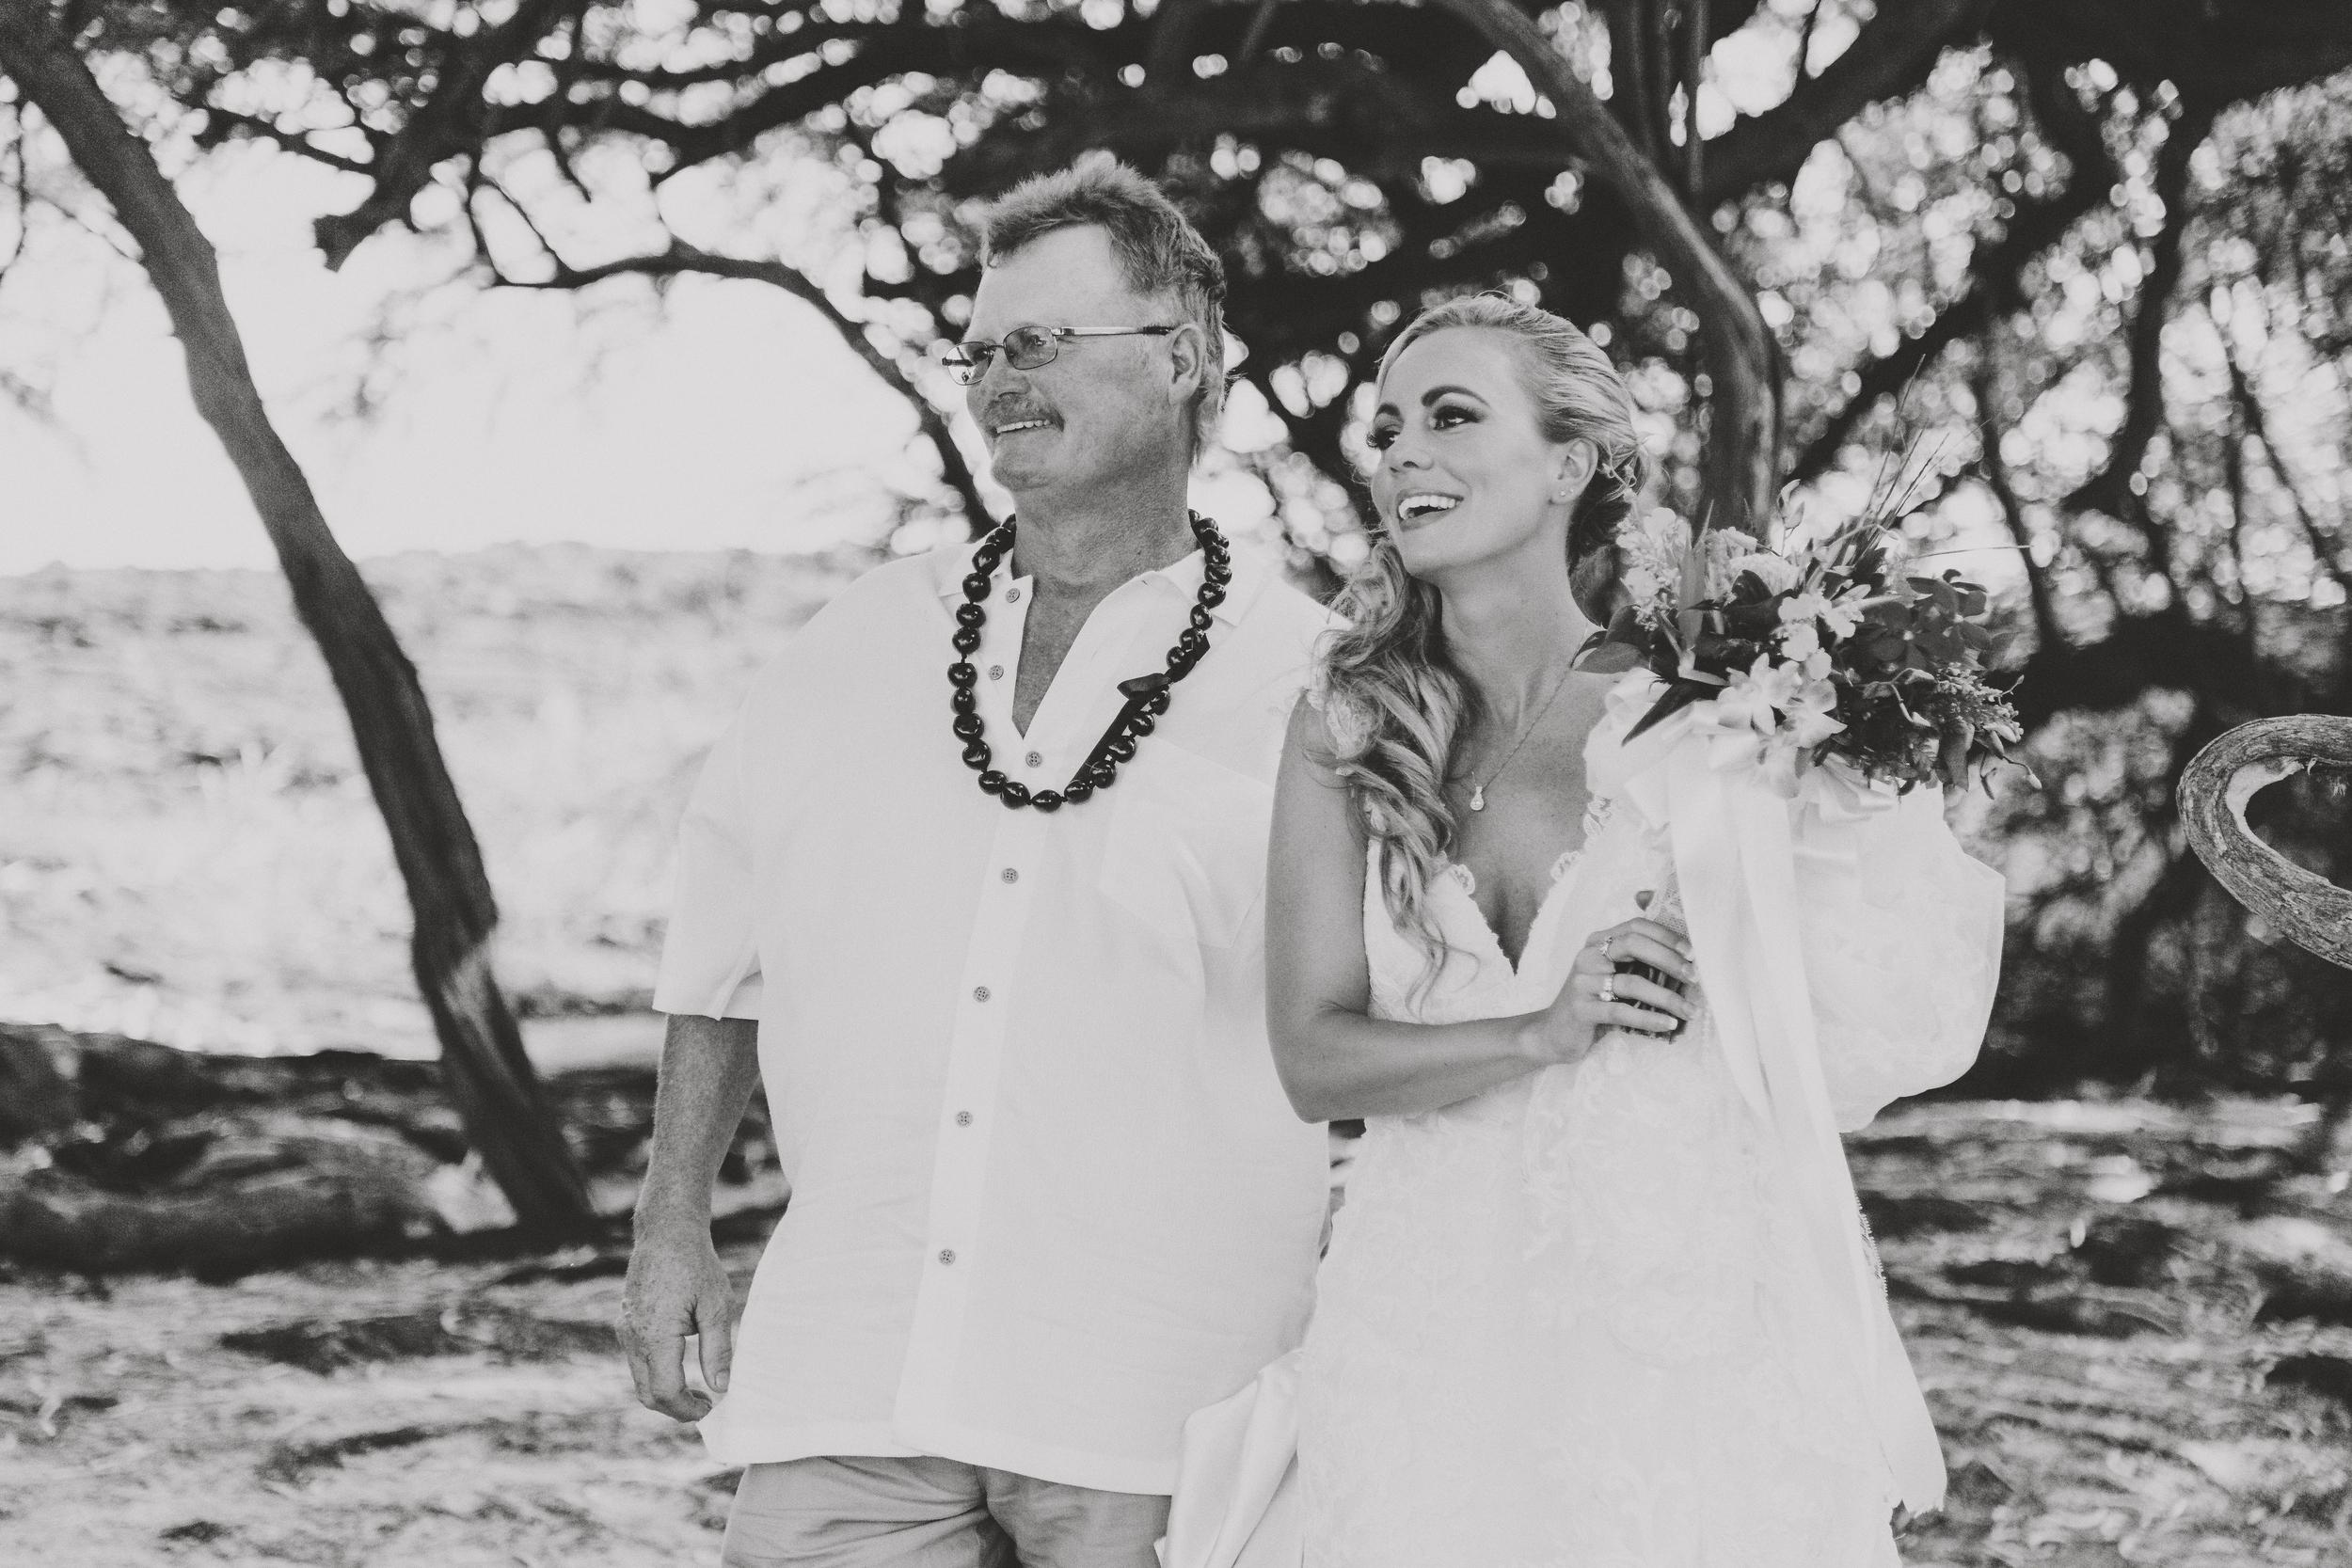 angie-diaz-photography-hawaii-wedding-photographer-kelli-jay-52.jpg